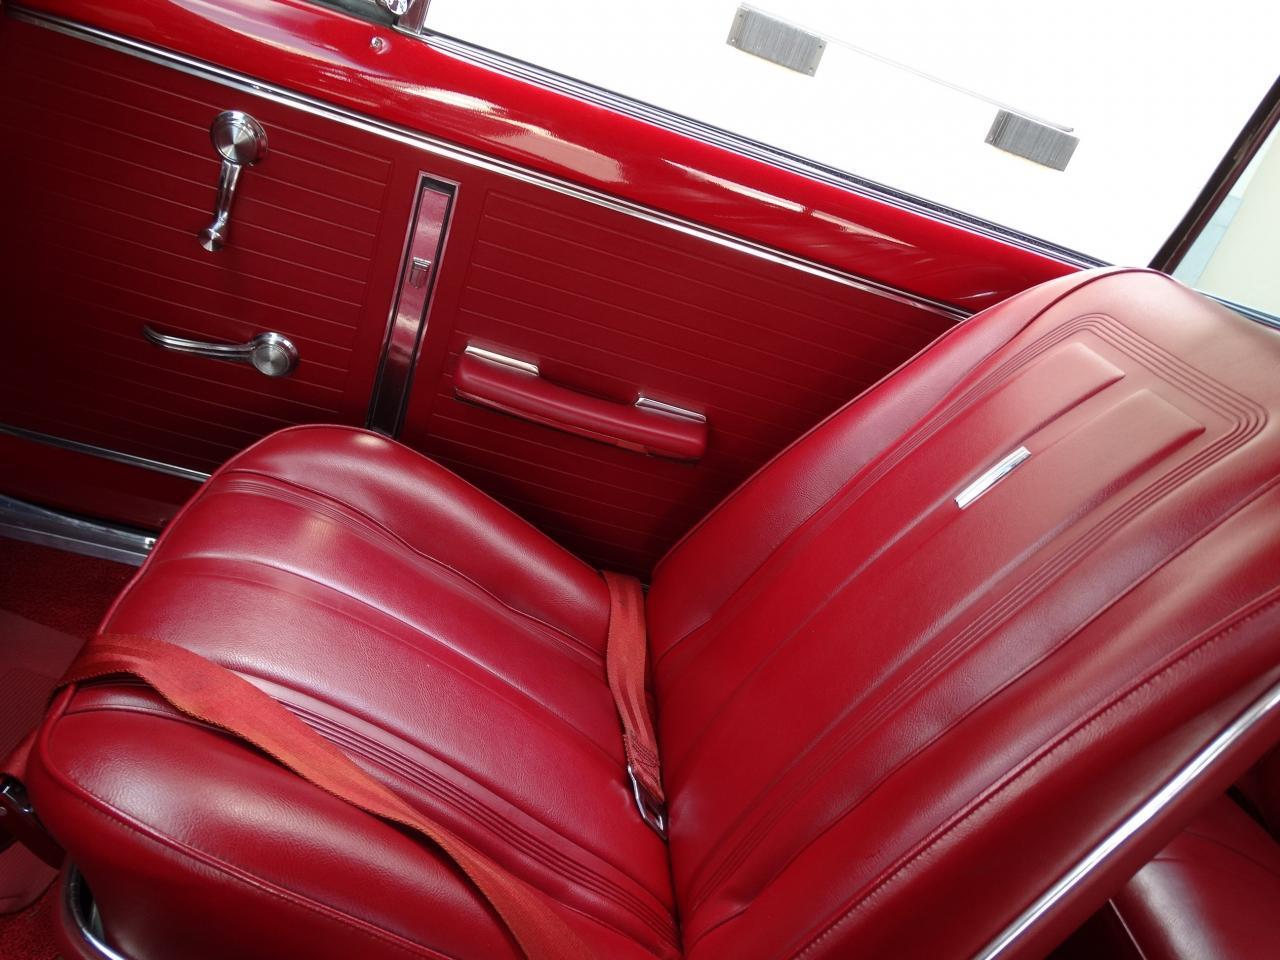 Large Picture of '66 Chevrolet Nova - $50,000.00 - KEGQ